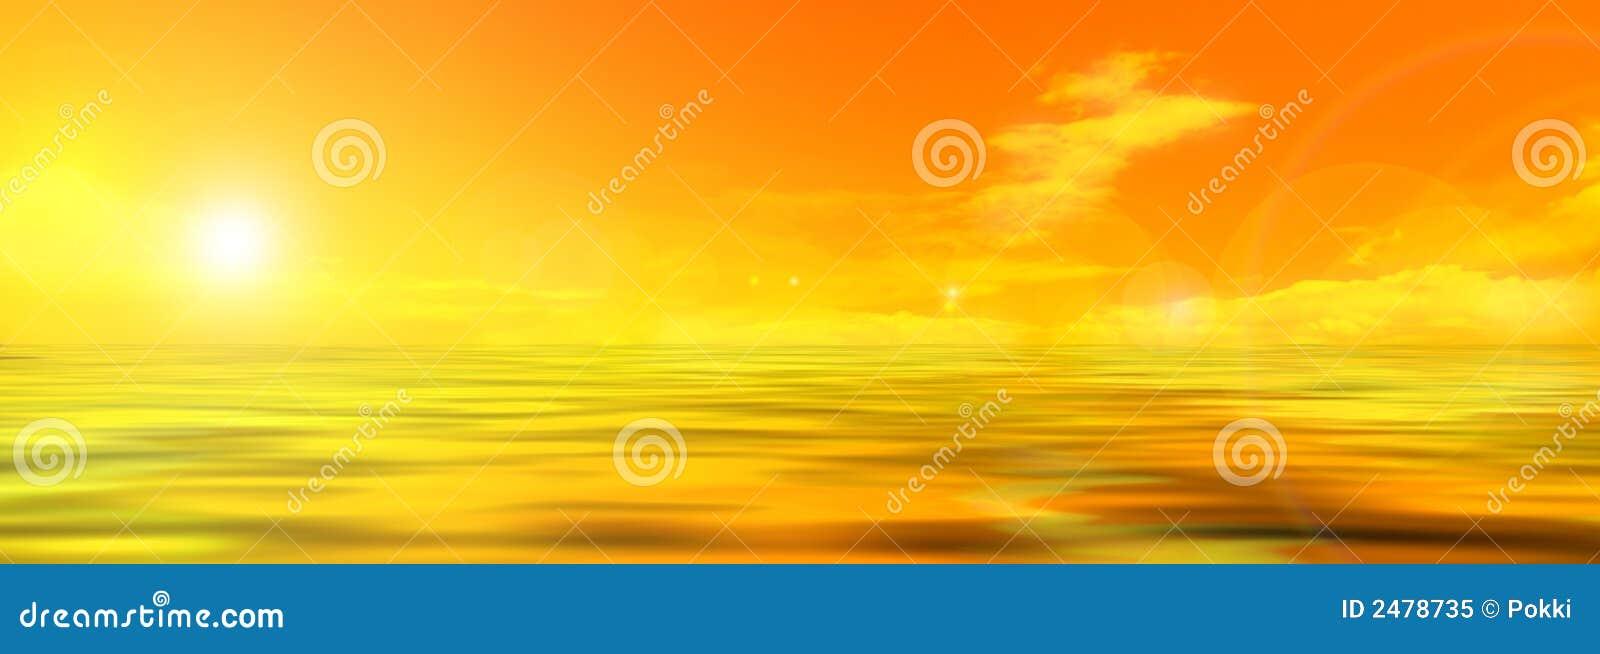 Panoramafoto des Himmels und des Meeres